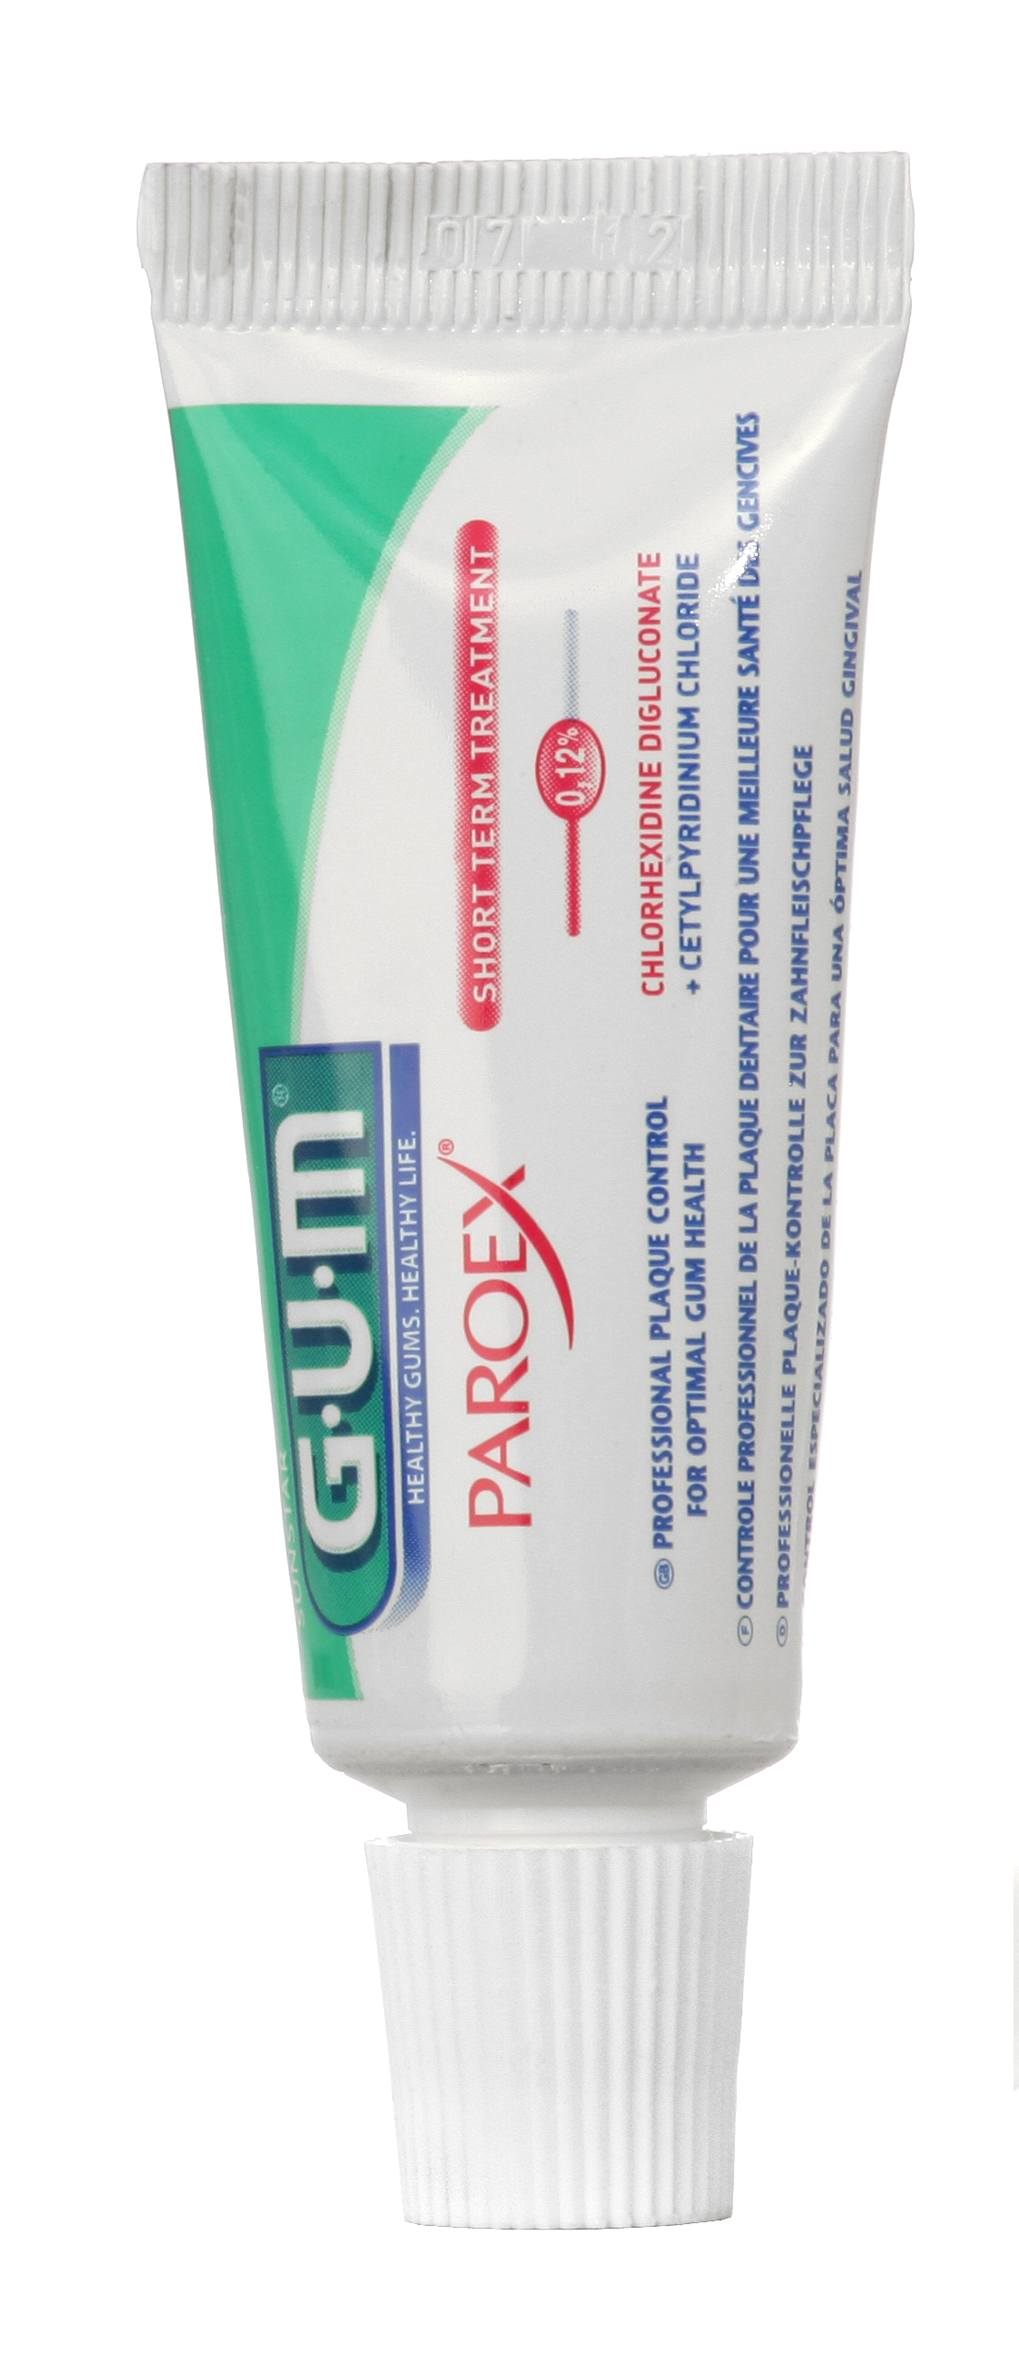 GUM Paroex, tandpasta, 0.06%CHX, med flour, 12.5 ml